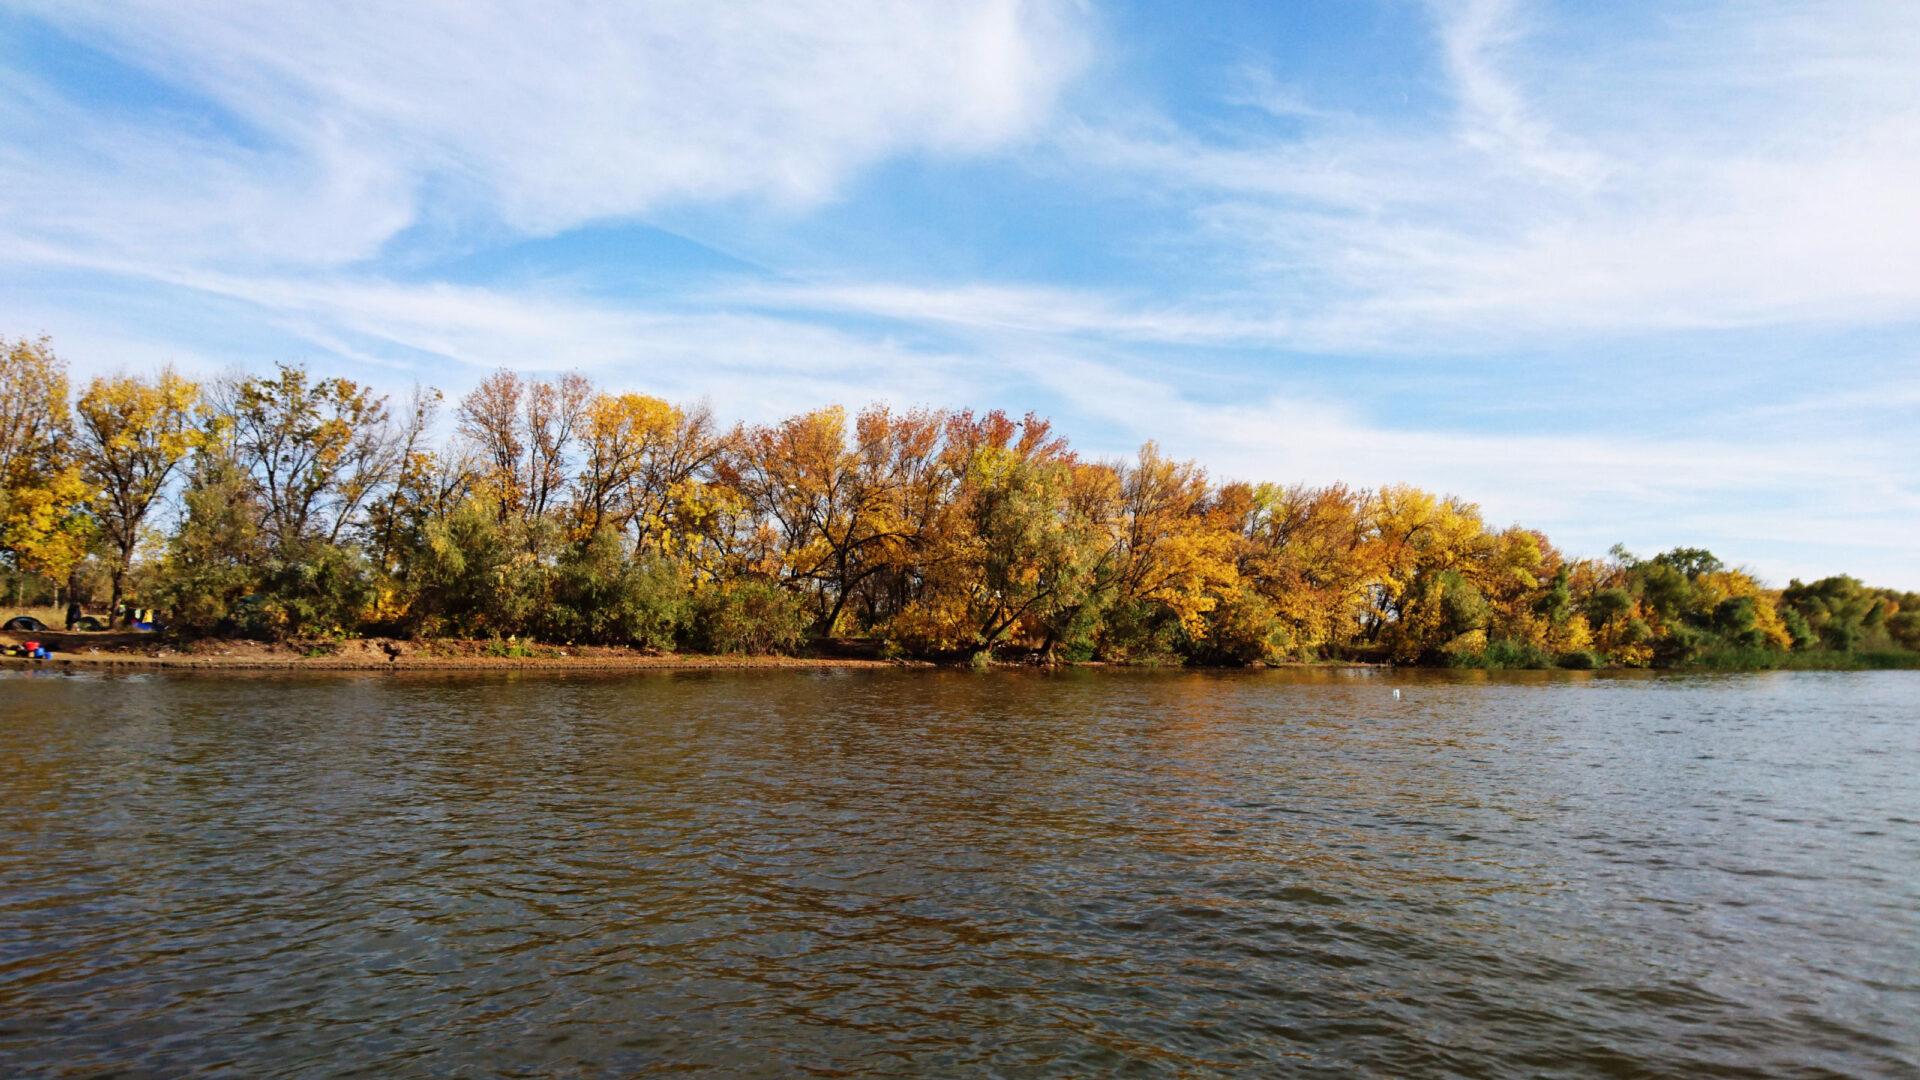 Волжские раскаты. Осенняя рыбалка.